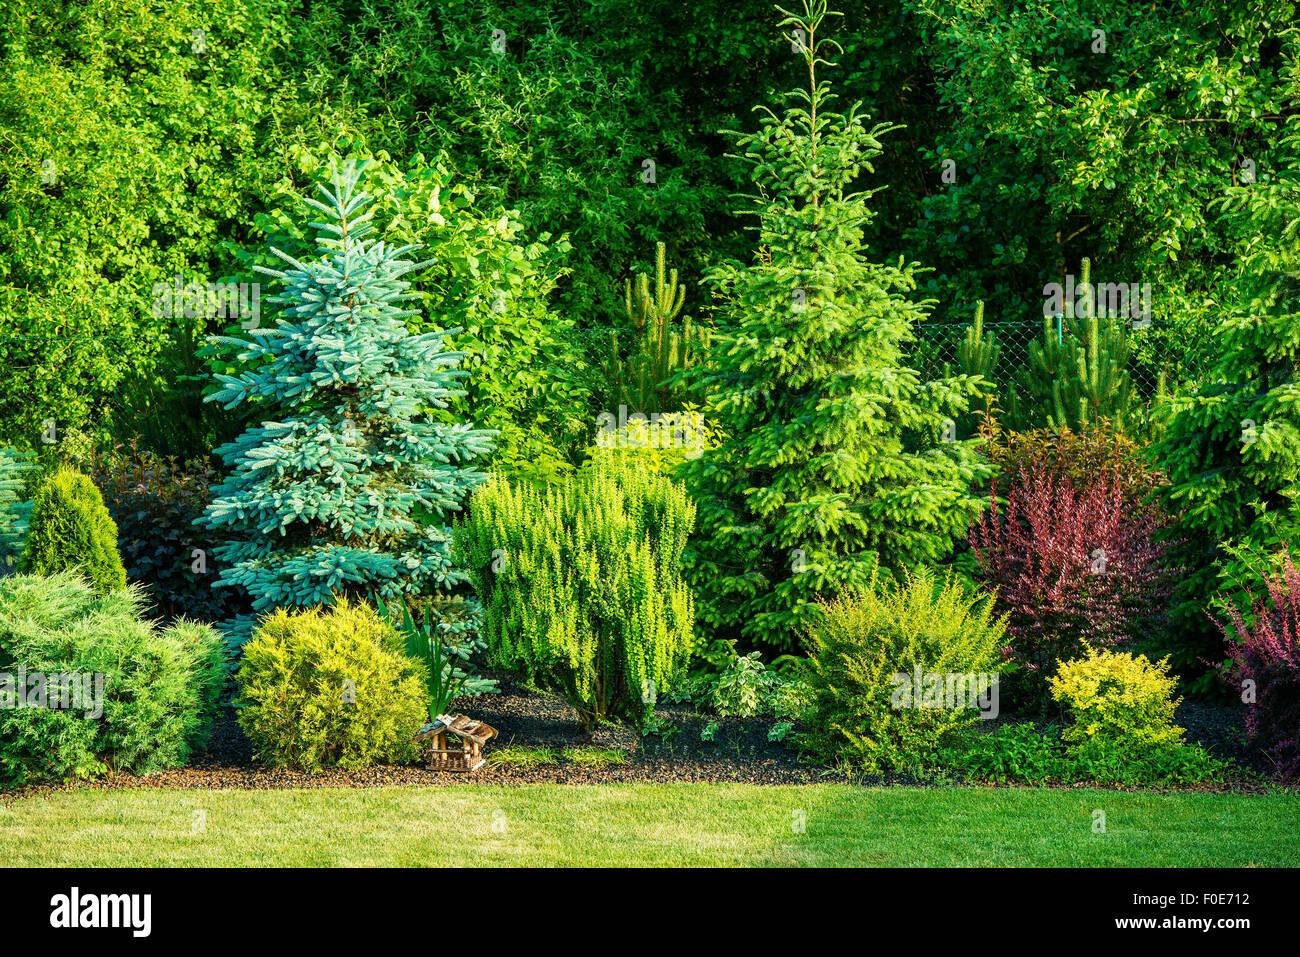 Backyard Garden With Various of Tree Species. Gardening Theme. - Stock Image